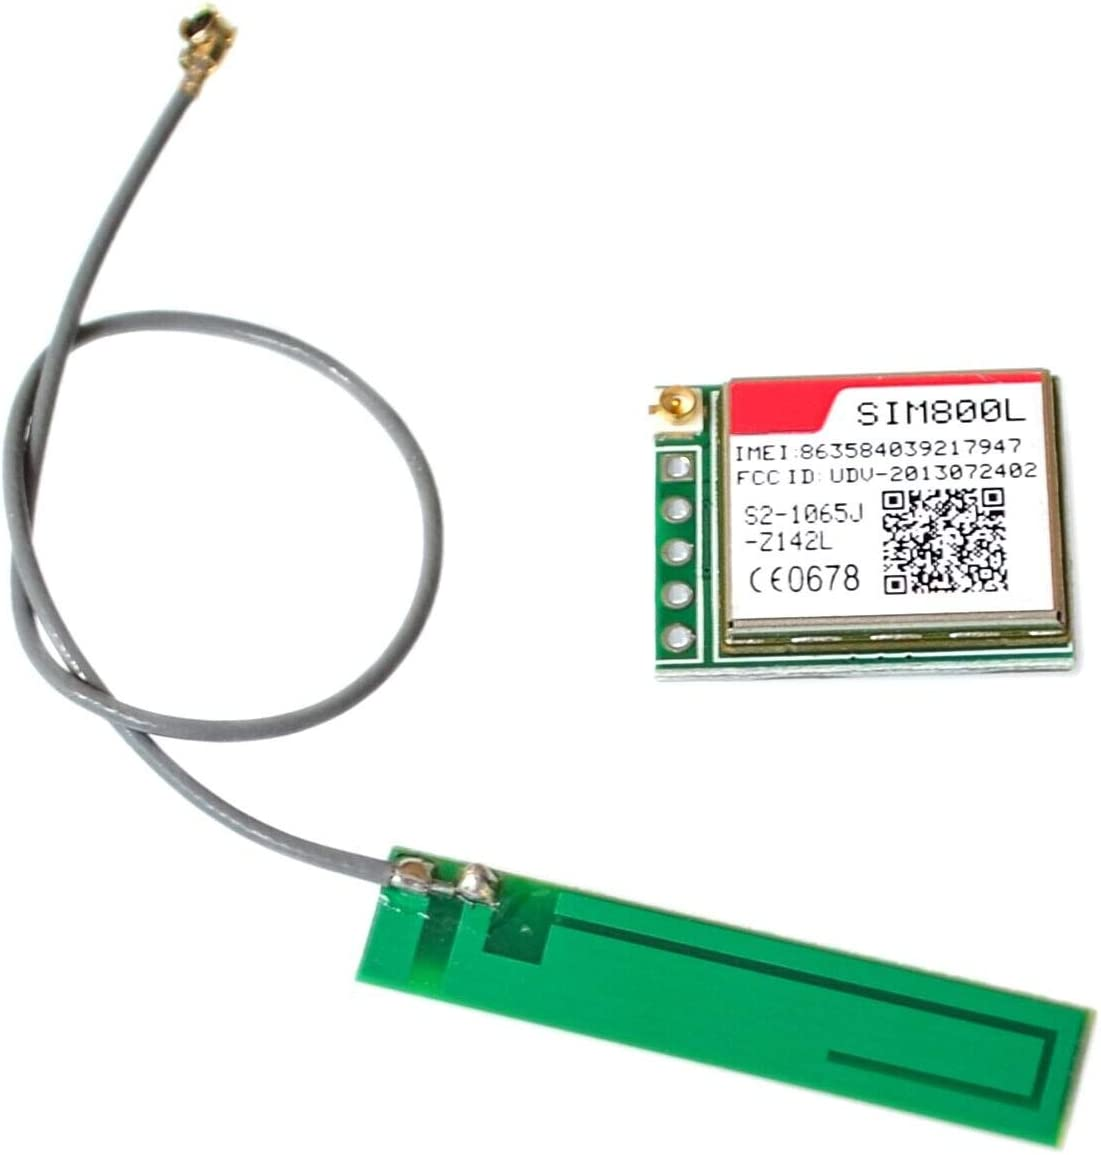 Xia Fly 10PCS//LOT SIM800L Wireless GSM GPRS Module Quad-Band W//Antenna Cable Cap